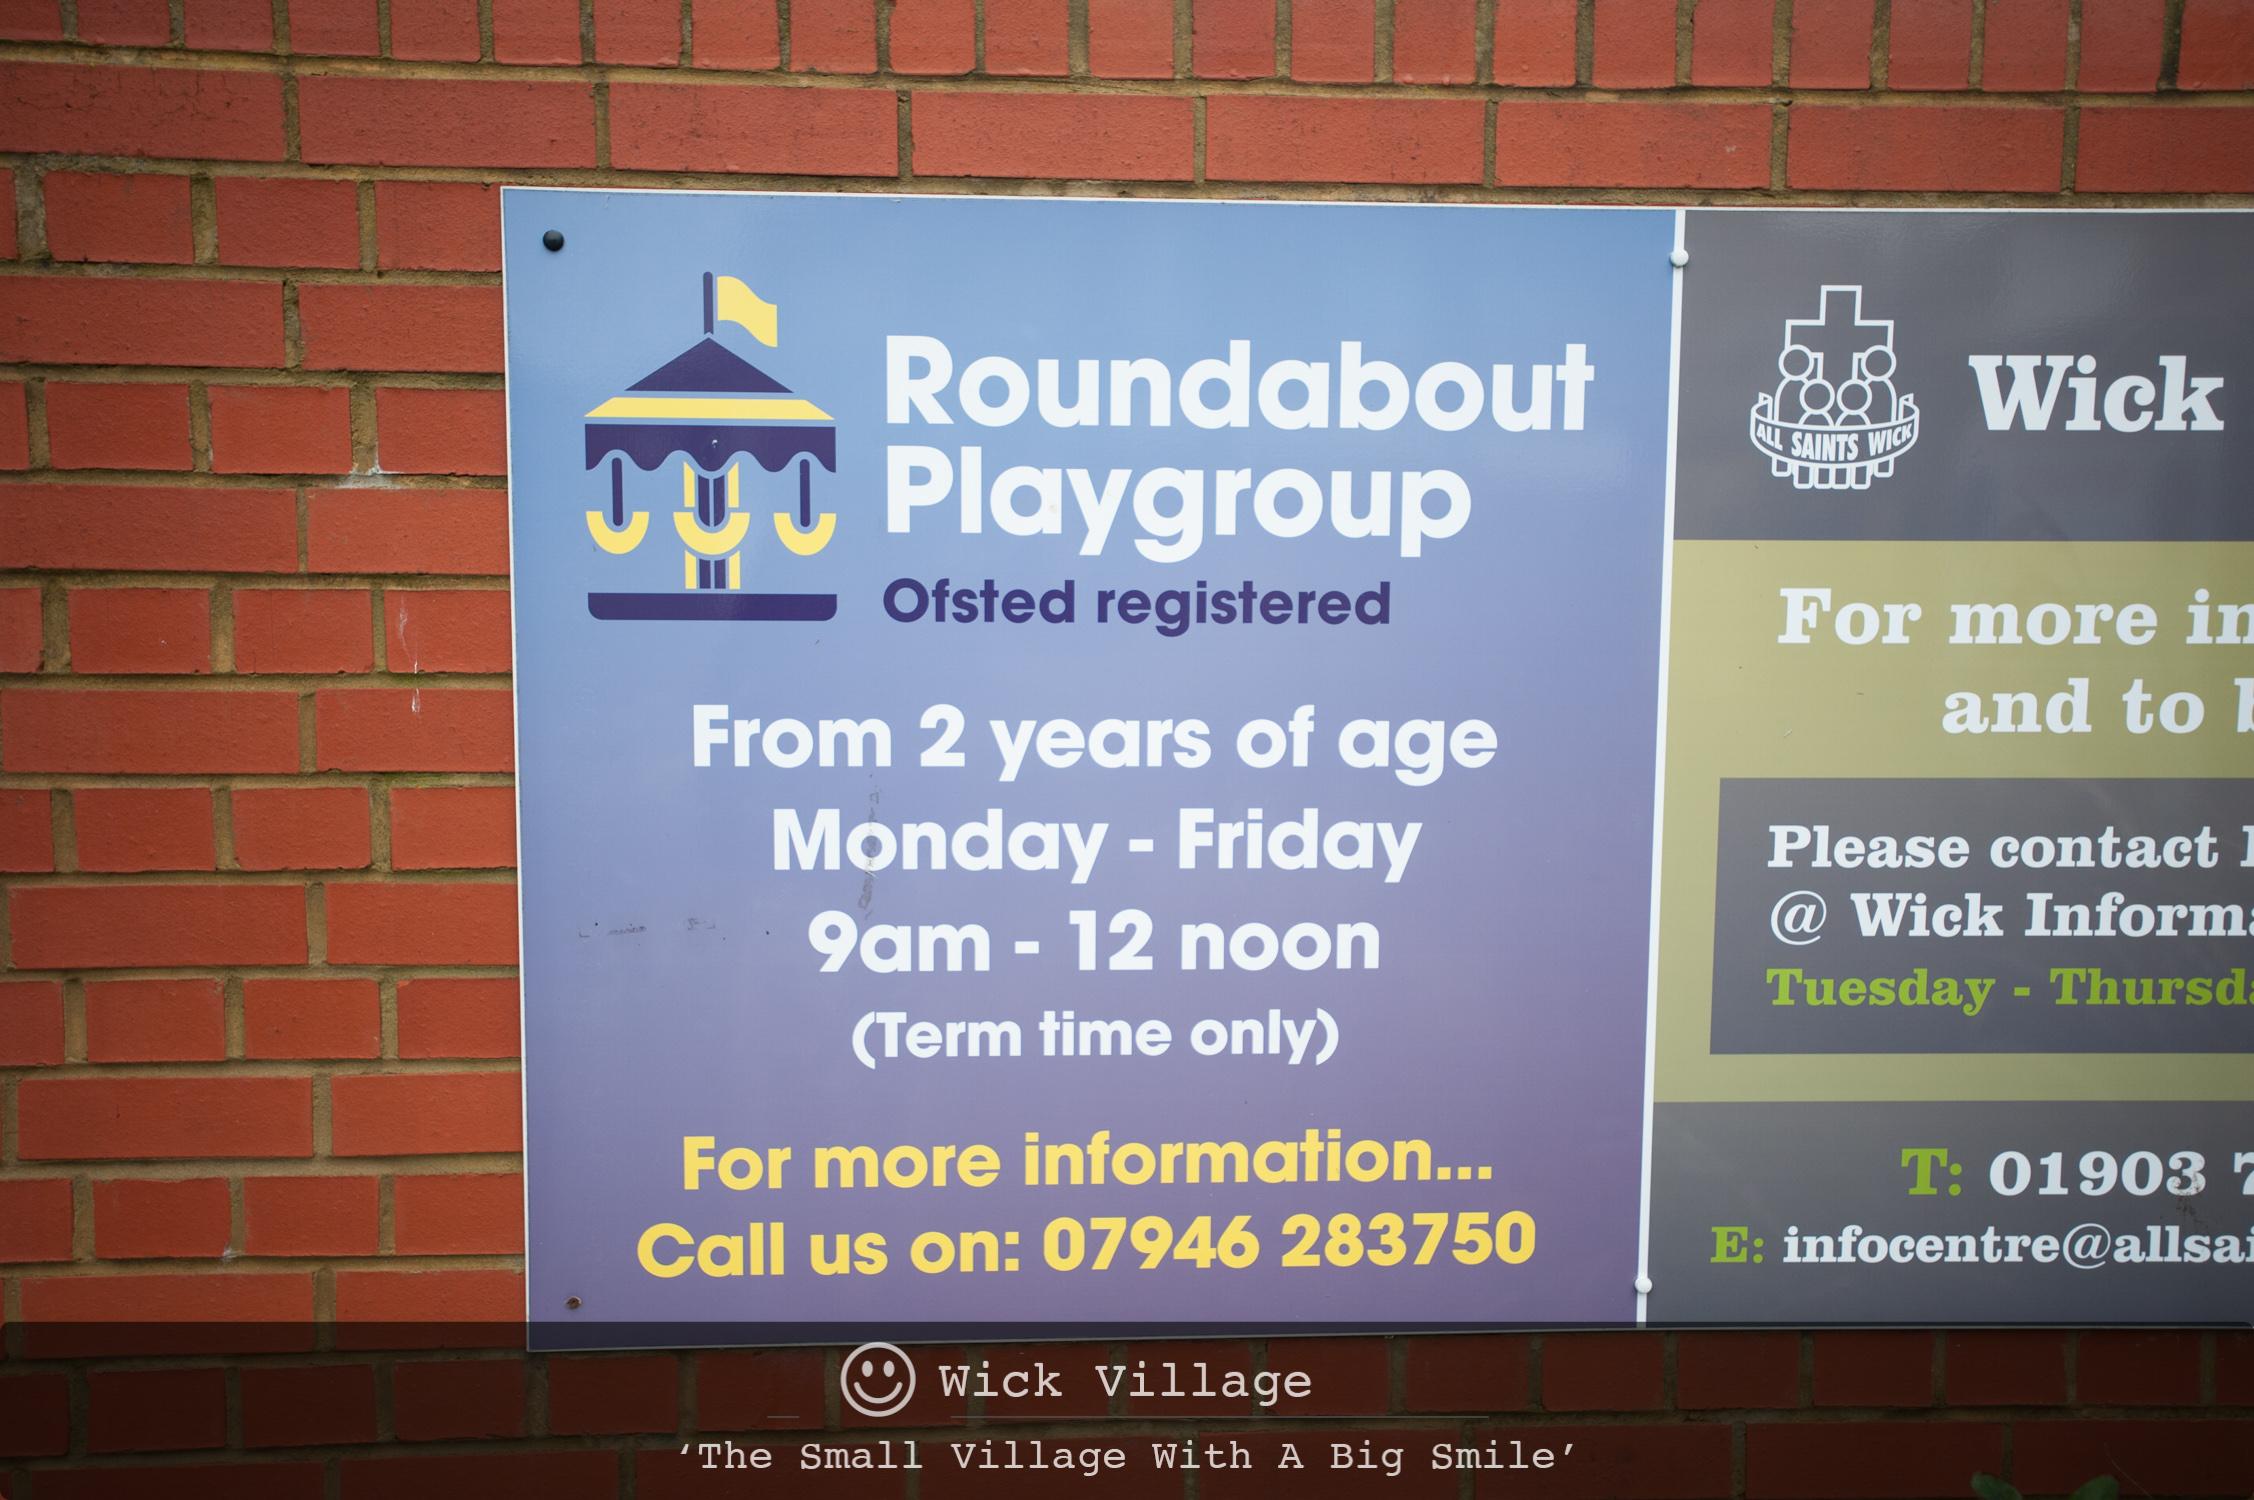 Roundabout Playgroup, Wick Village, Littlehampton.